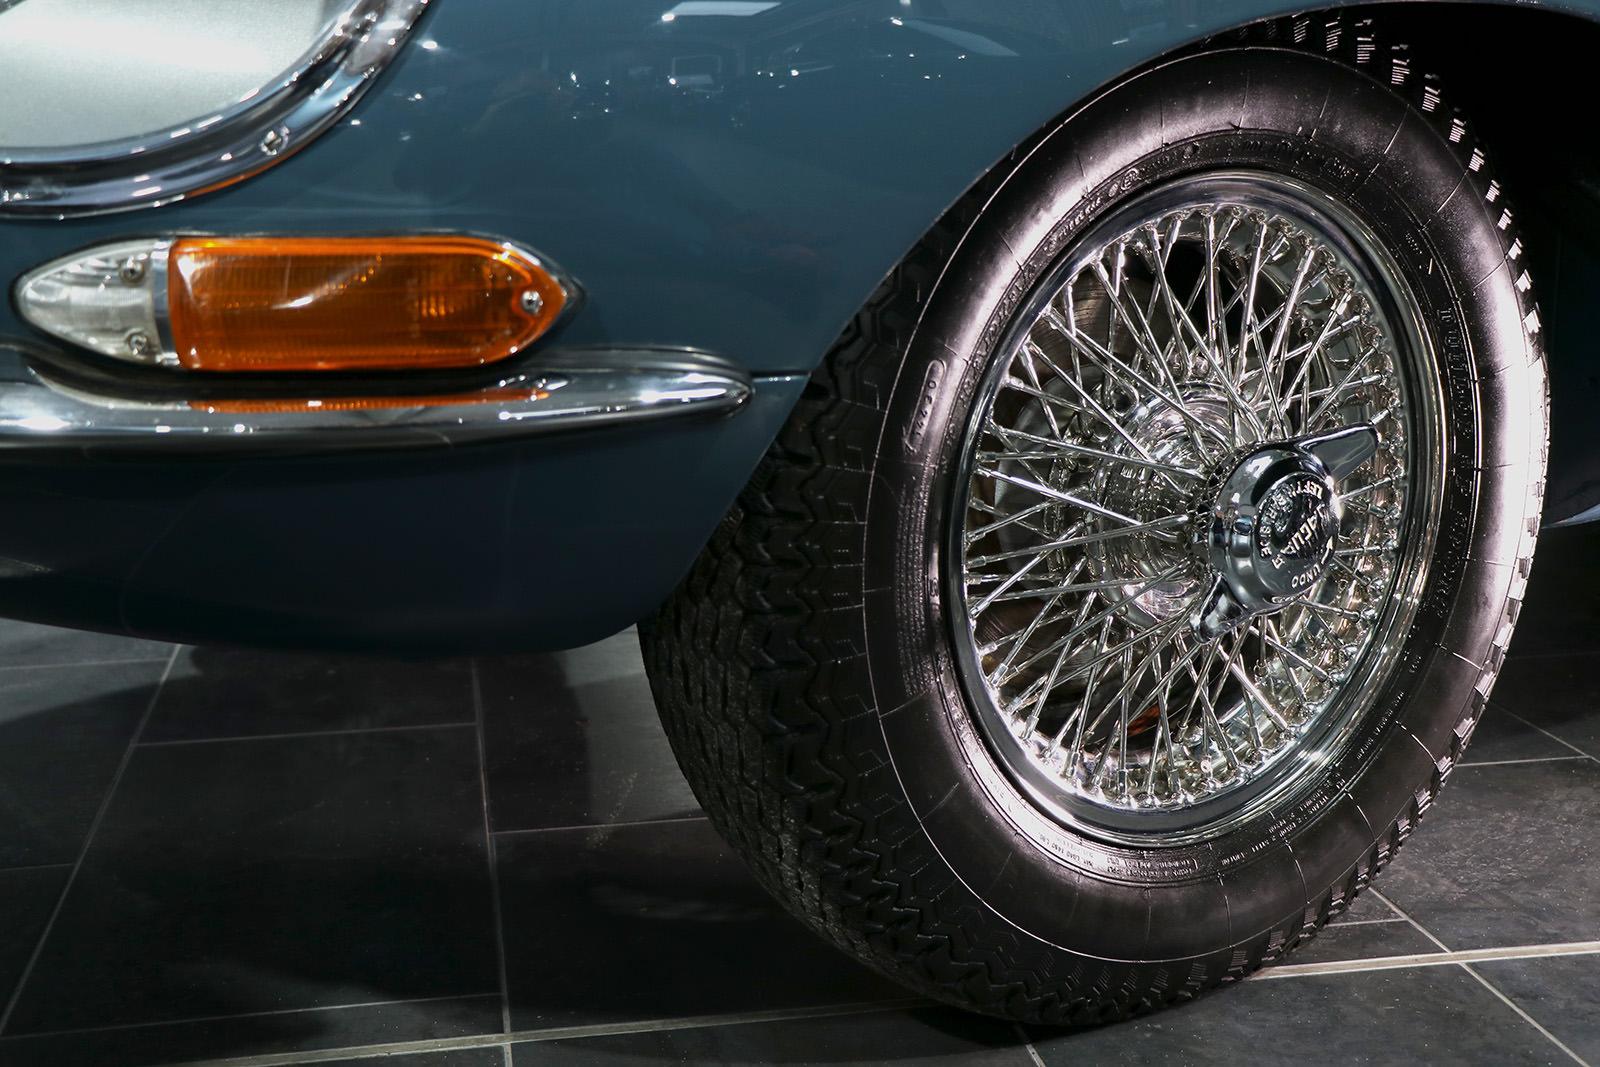 1963_cotswold_blue_series 1_jaguar_etype_sayer_selection_wilkinson_web_8.jpg